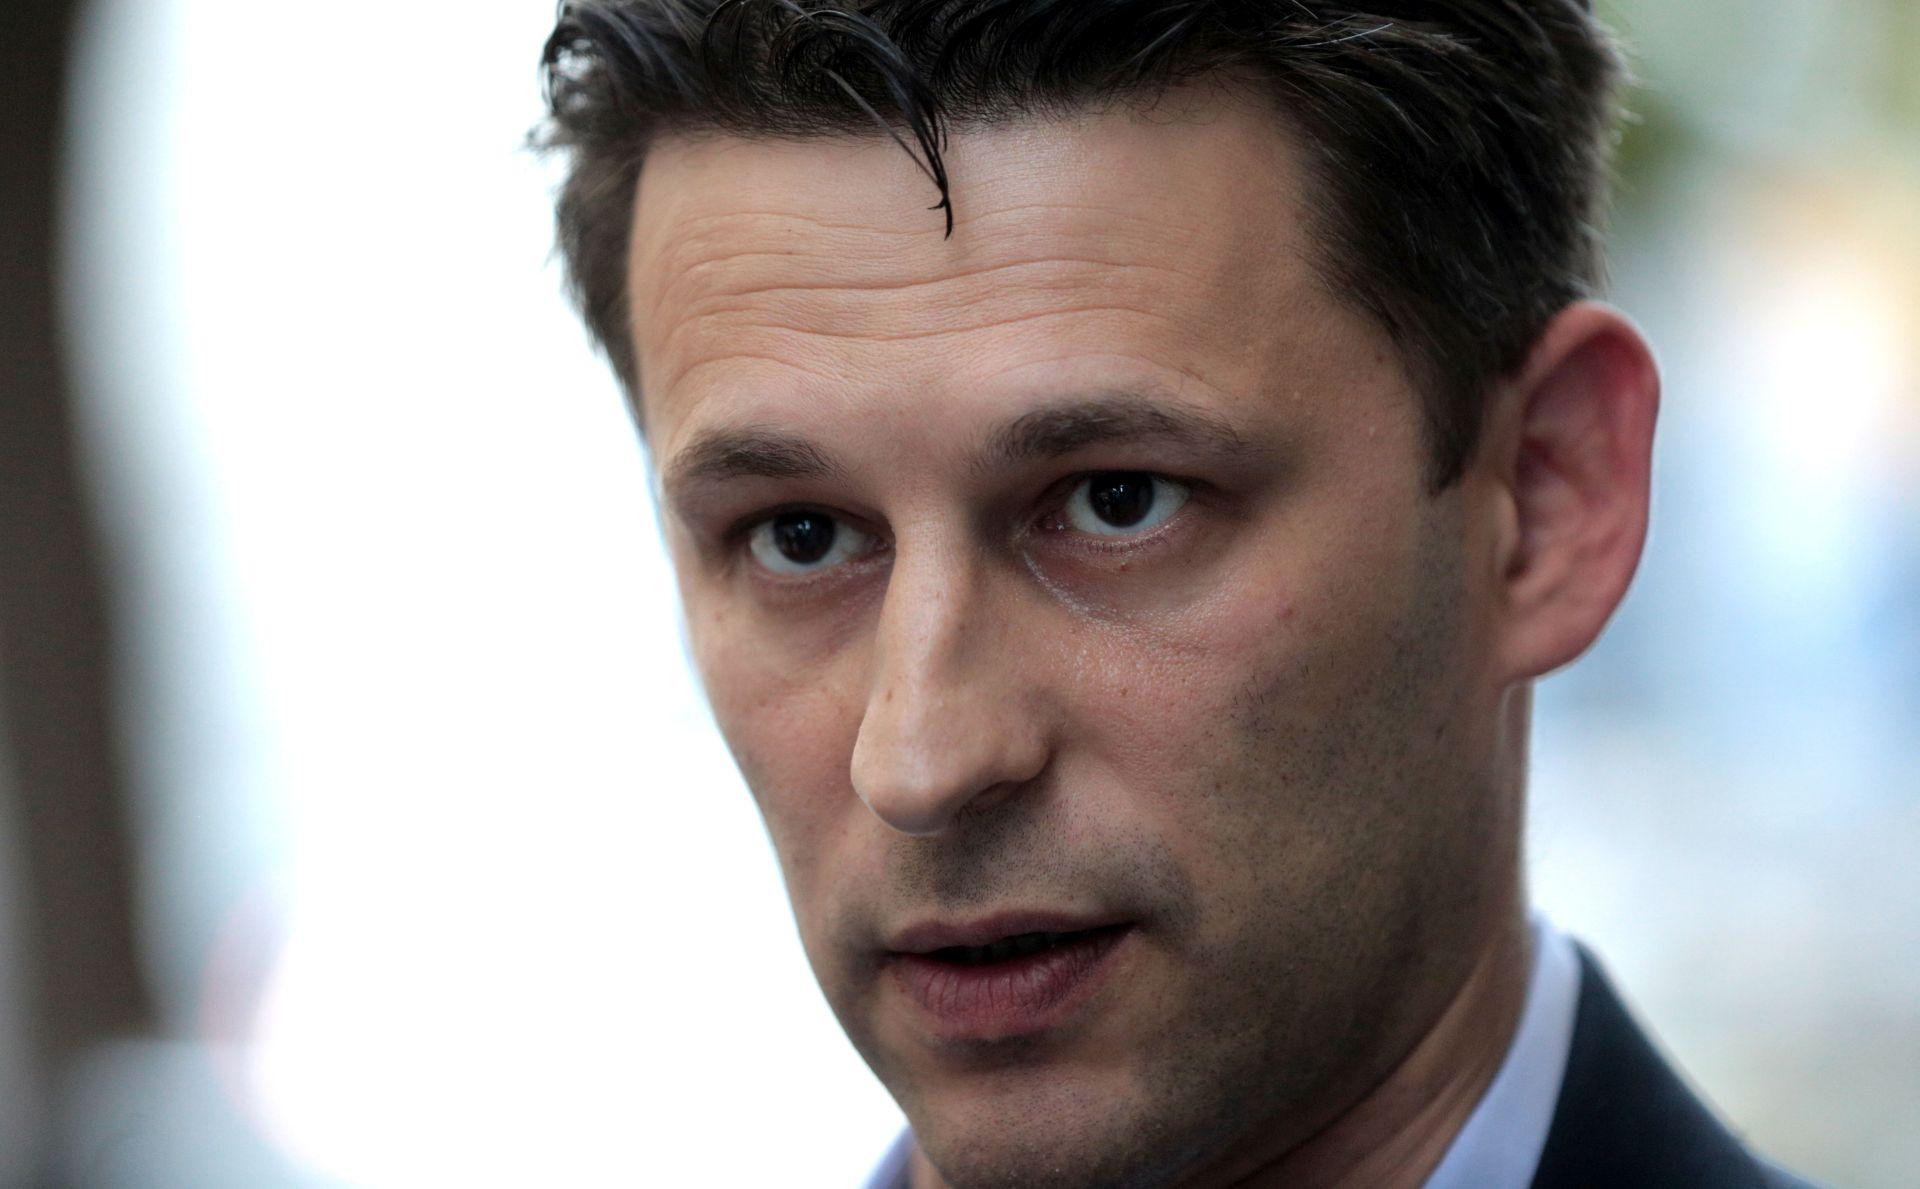 Bivši predsjednik Sabora Božo Petrov postao potpredsjednik